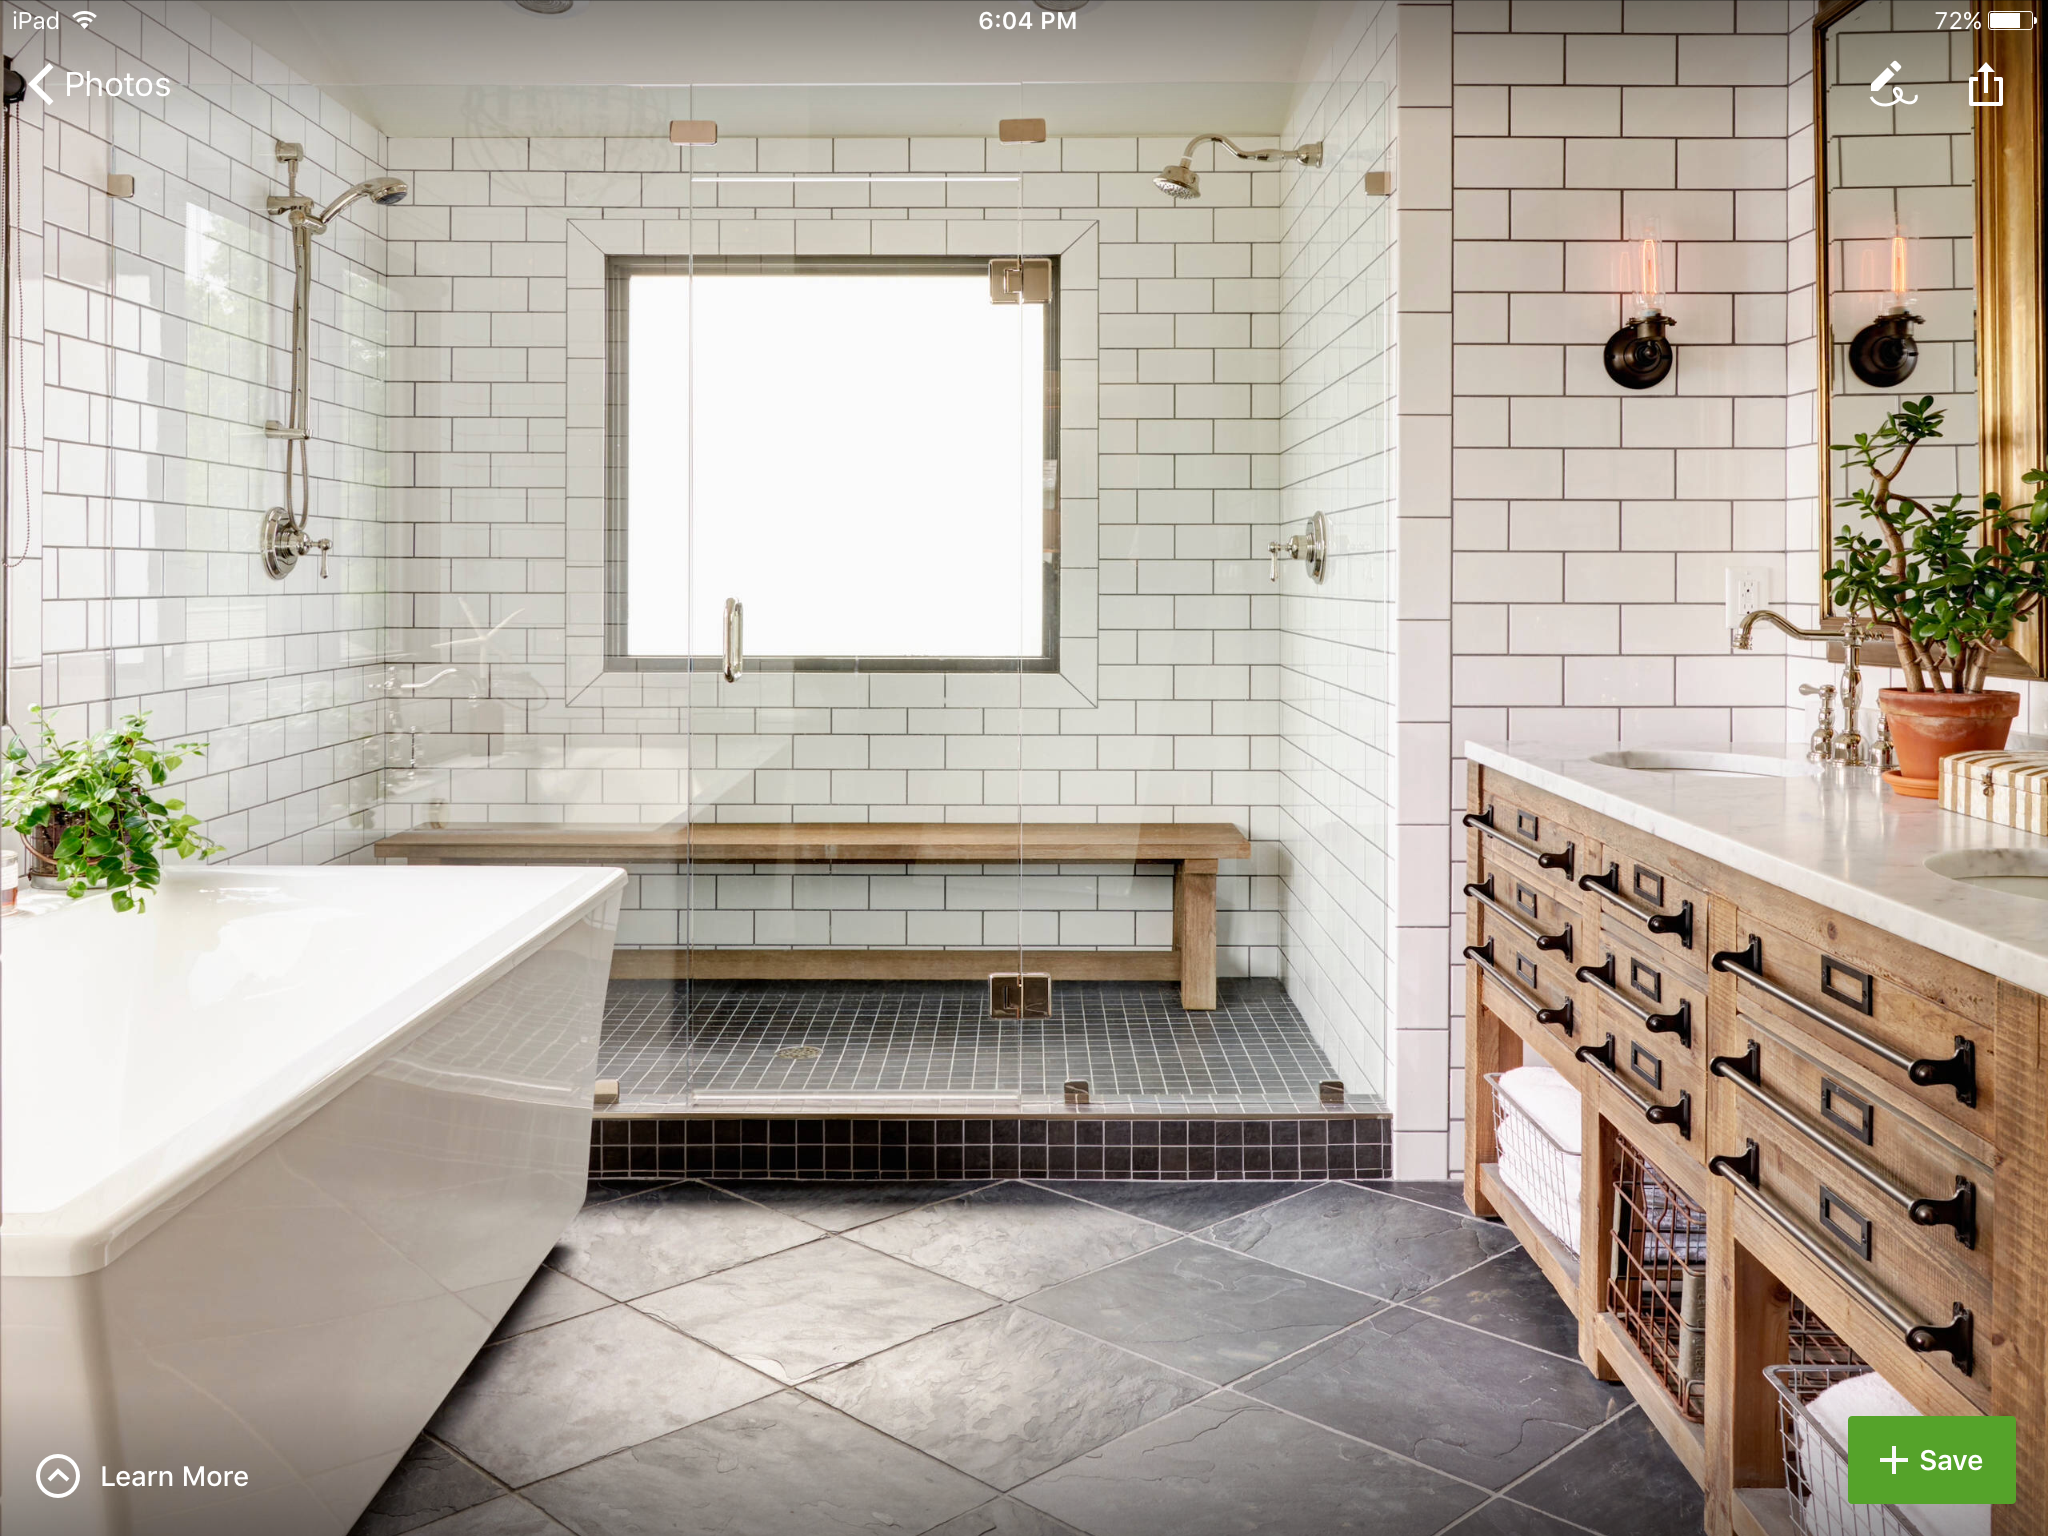 Uncategorized reclaimed subway tile purecolonsdetoxreviews home design uncategorized reclaimed subway tile reclaimed wood vanity dark floors white subway tiles master tiles dailygadgetfo Images